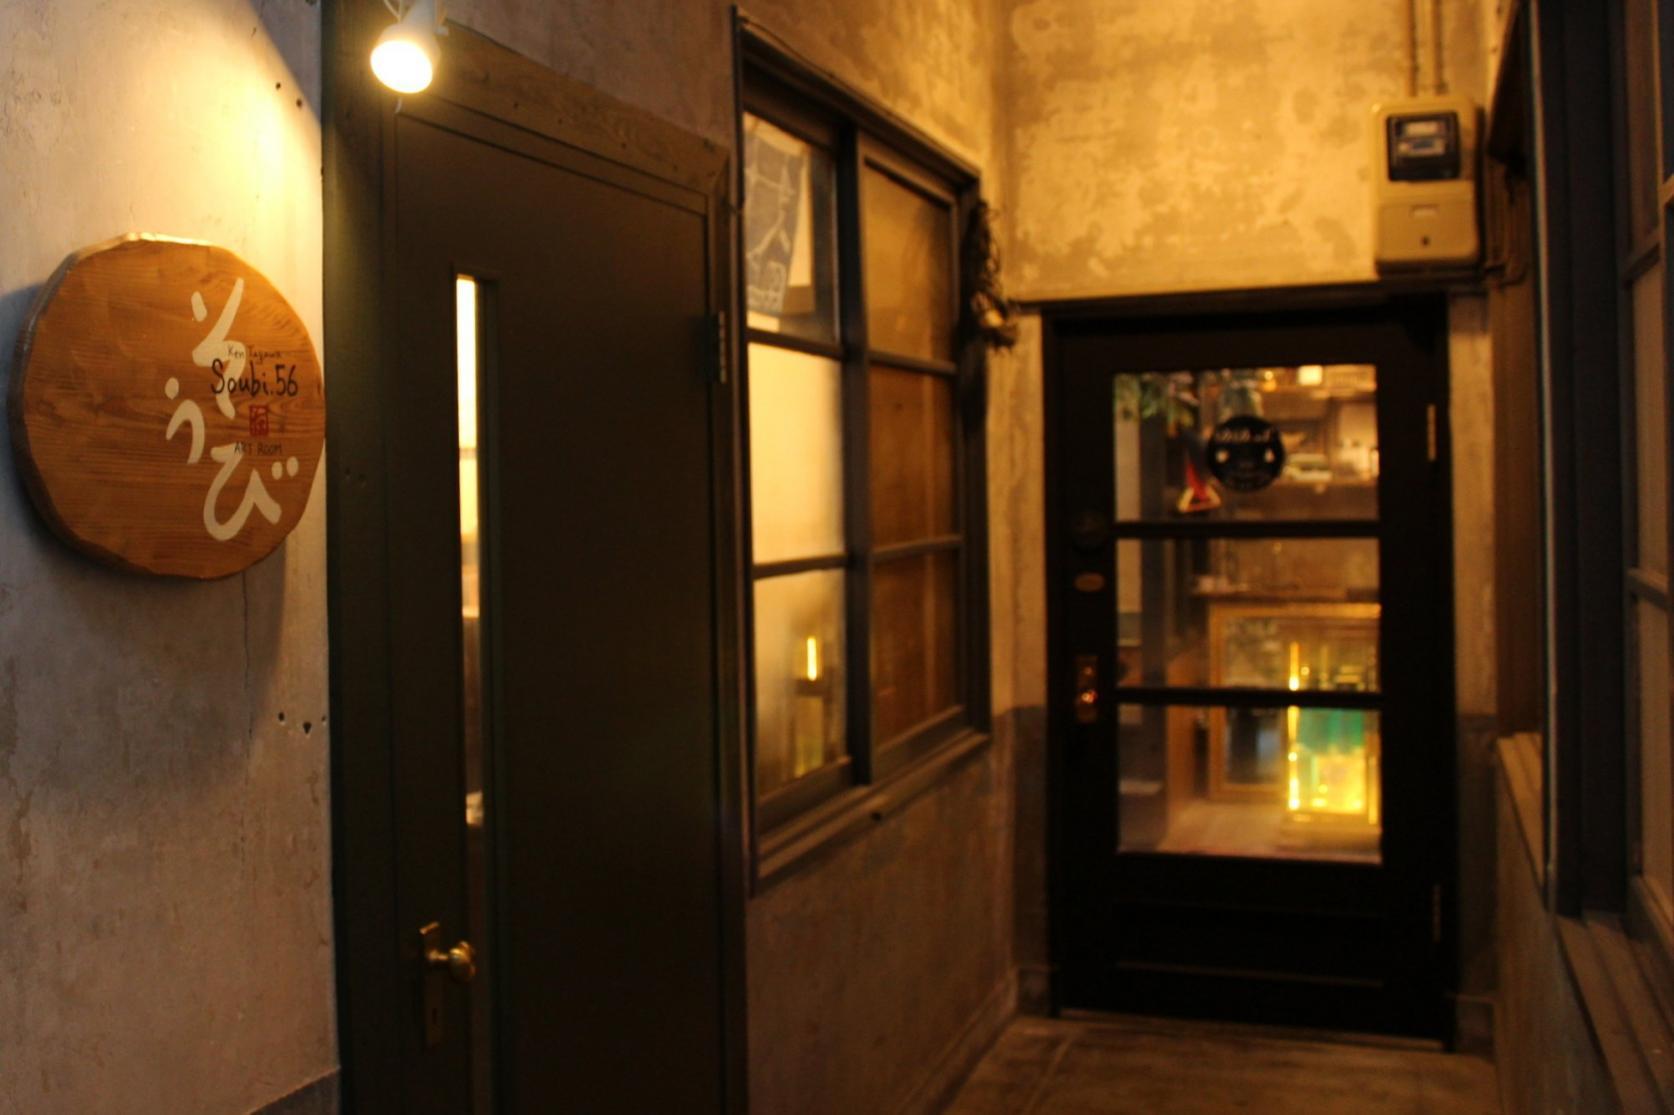 【Soubi'56】 長崎を愛した版画家 田川憲の魅力を発信するアートルーム-1